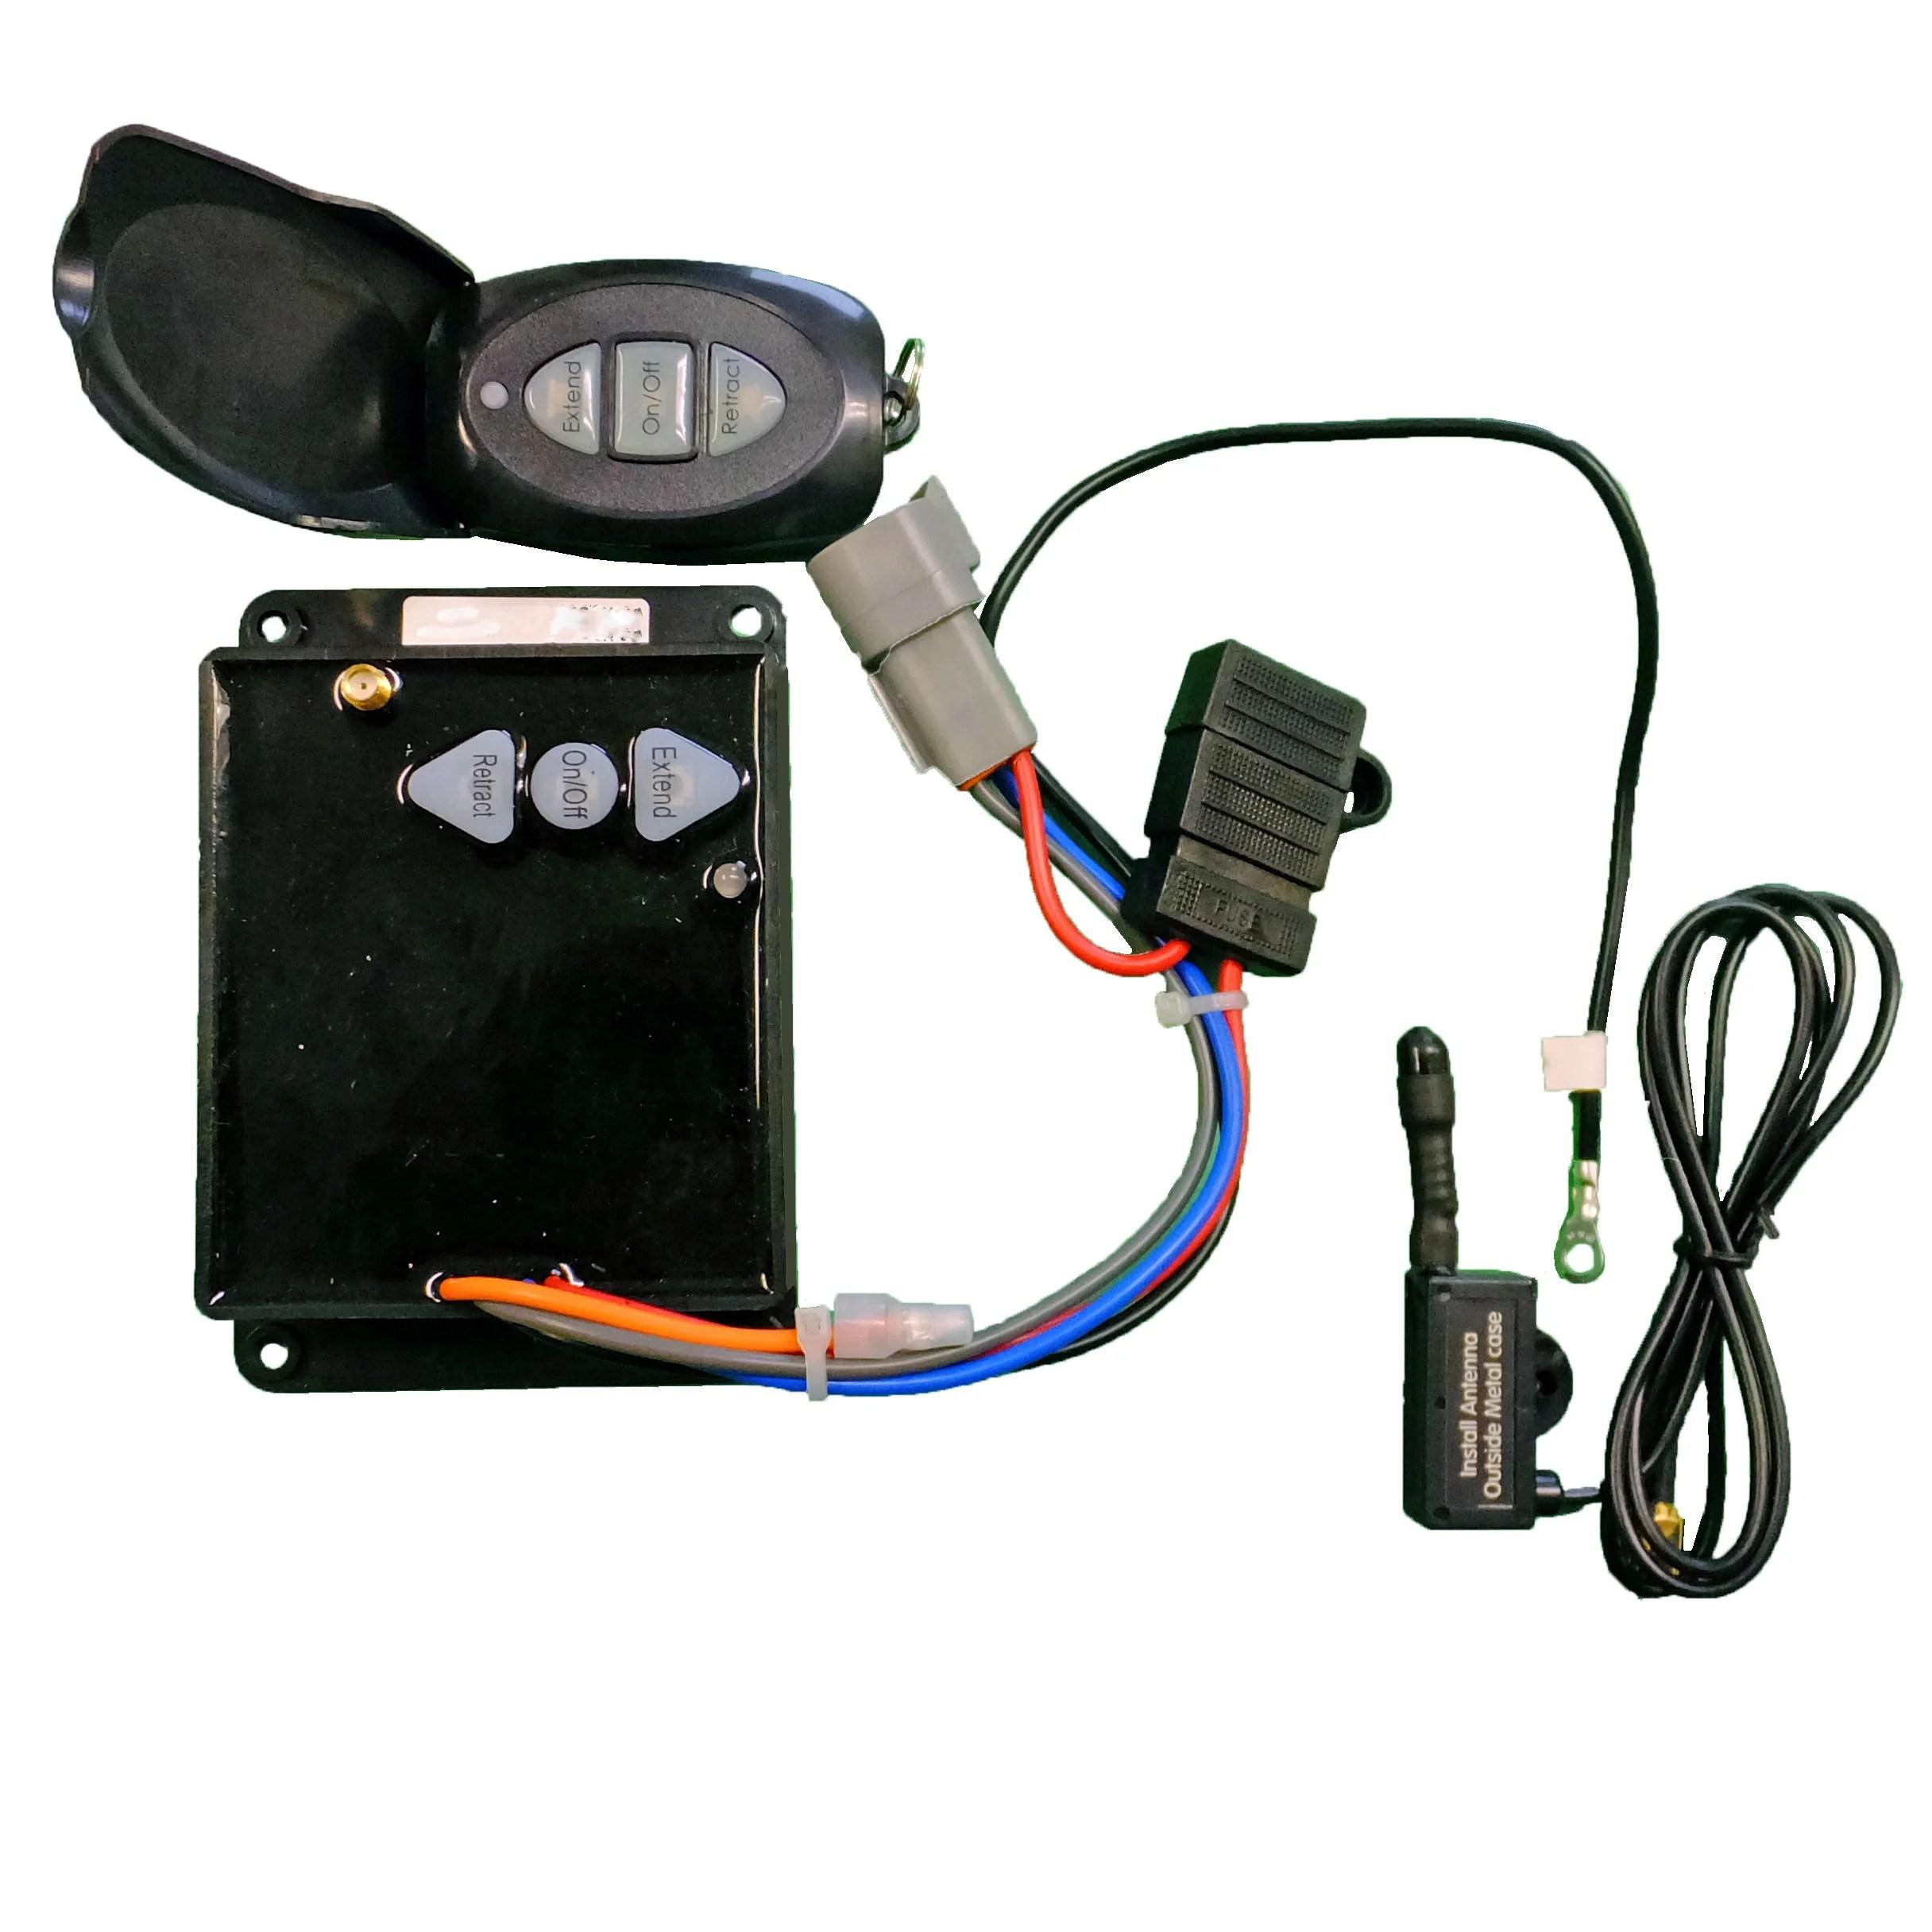 wireless dump trailer remote kit bucher easy install power up gravi www ordertrailerparts com [ 2432 x 2432 Pixel ]